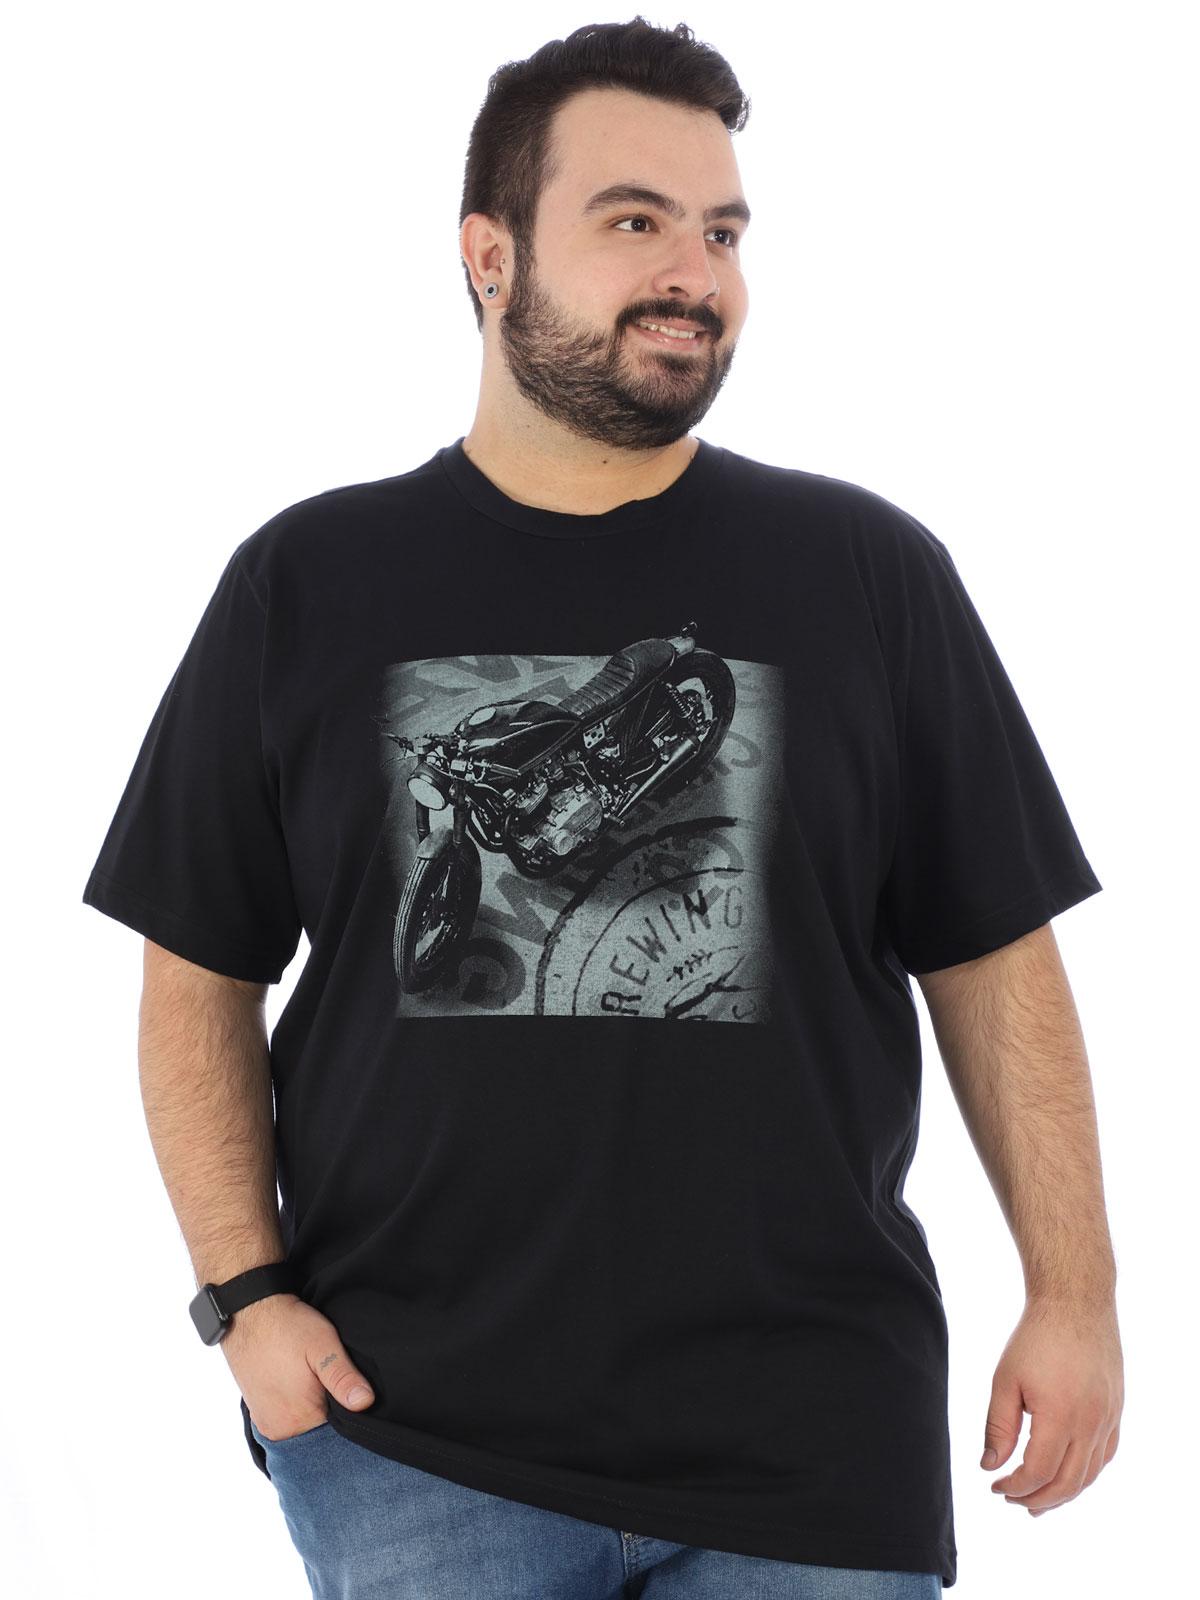 Camiseta Plus Size Masculina Estampada Manga Curta Preta